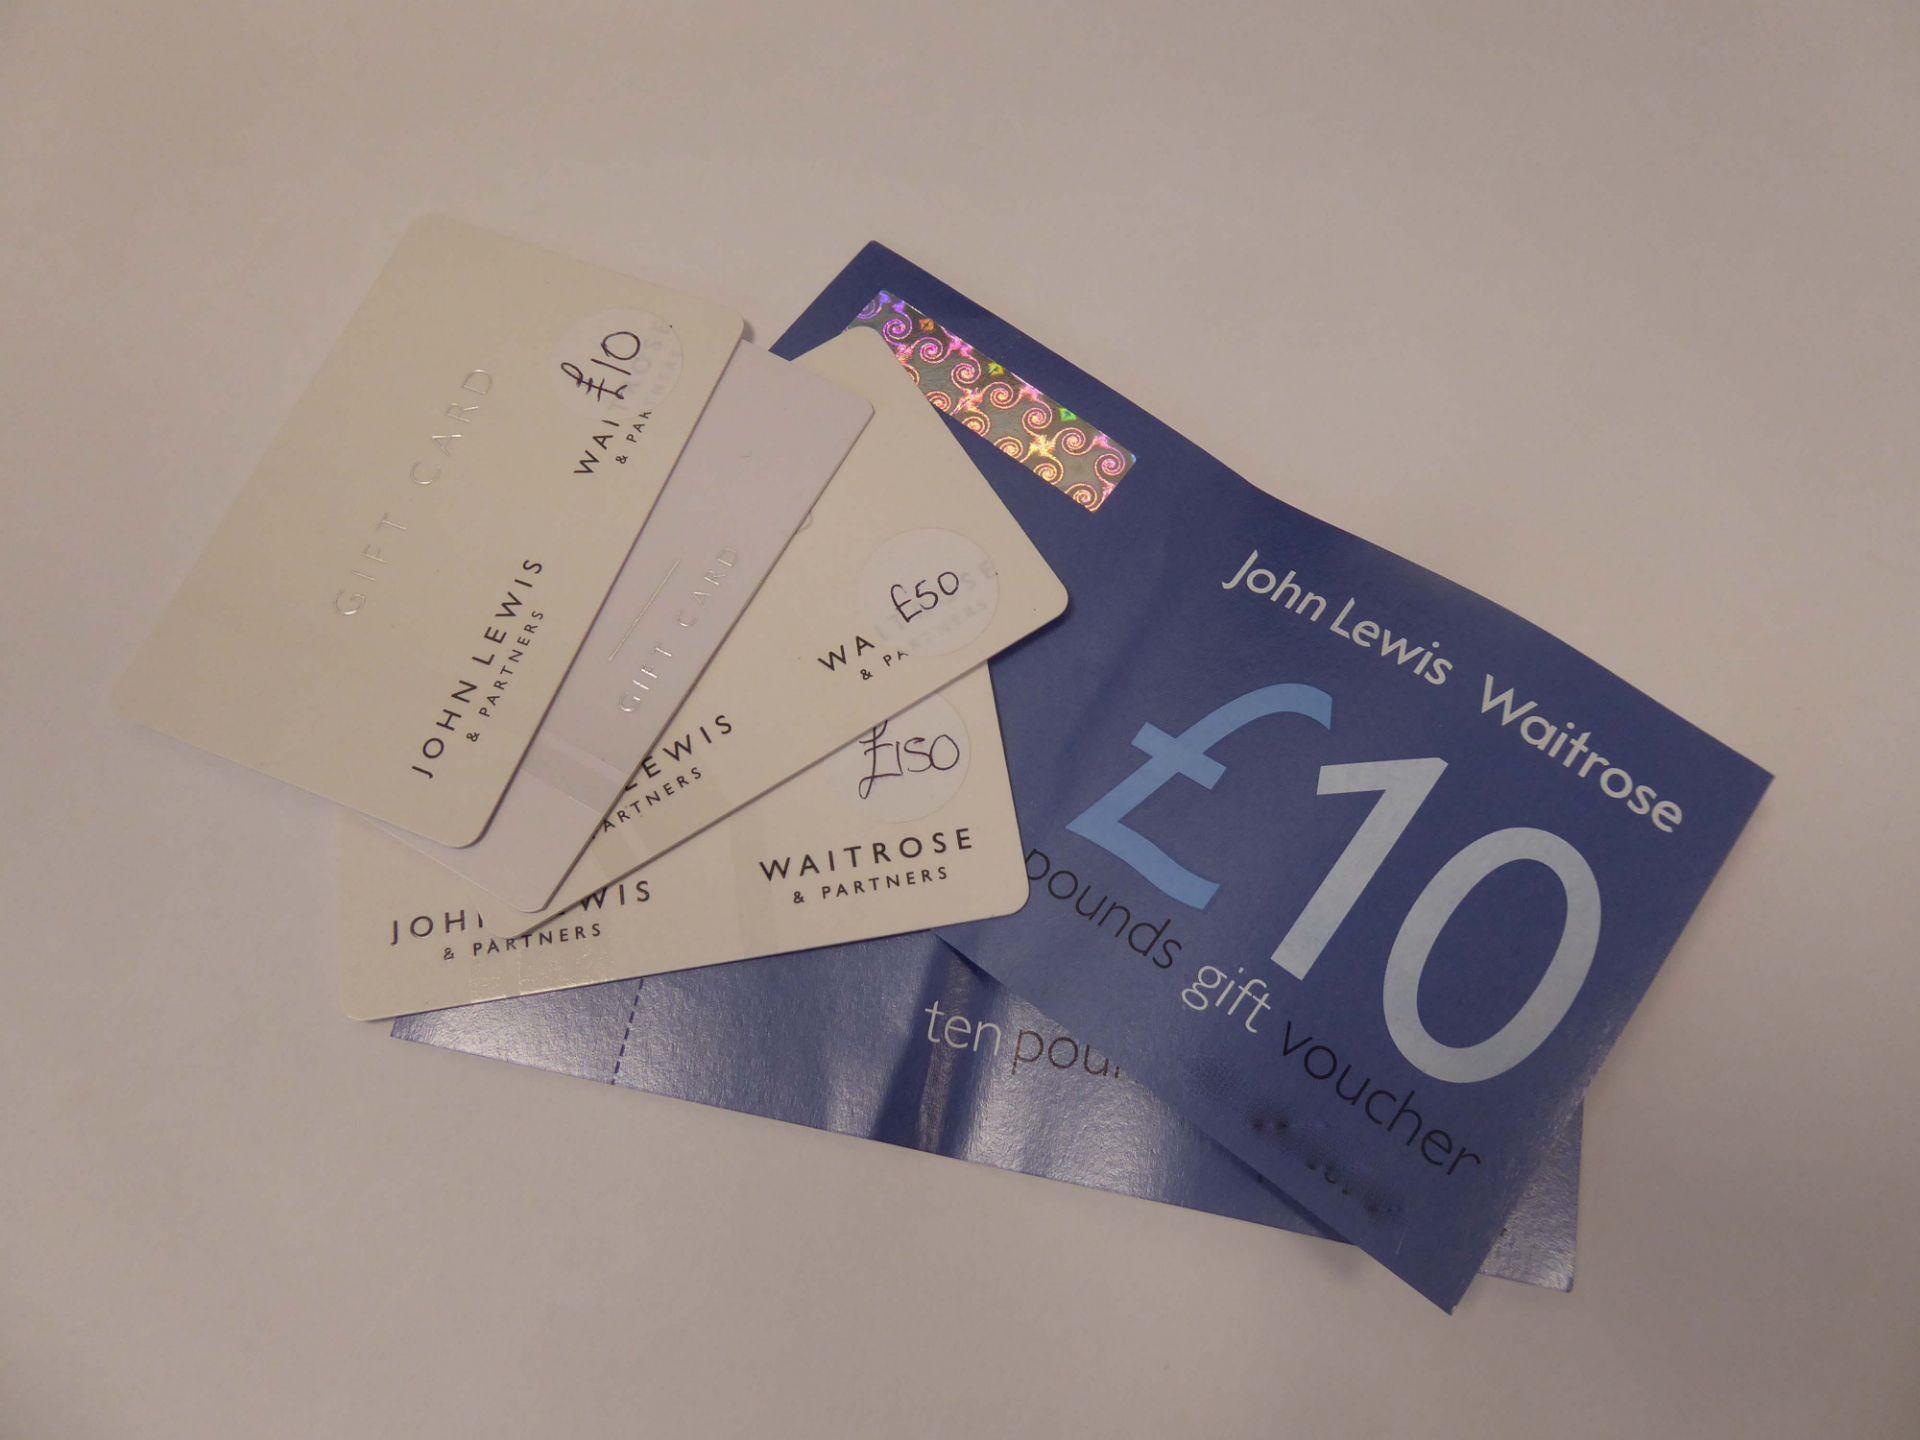 John Lewis (x5) - Total face value £255